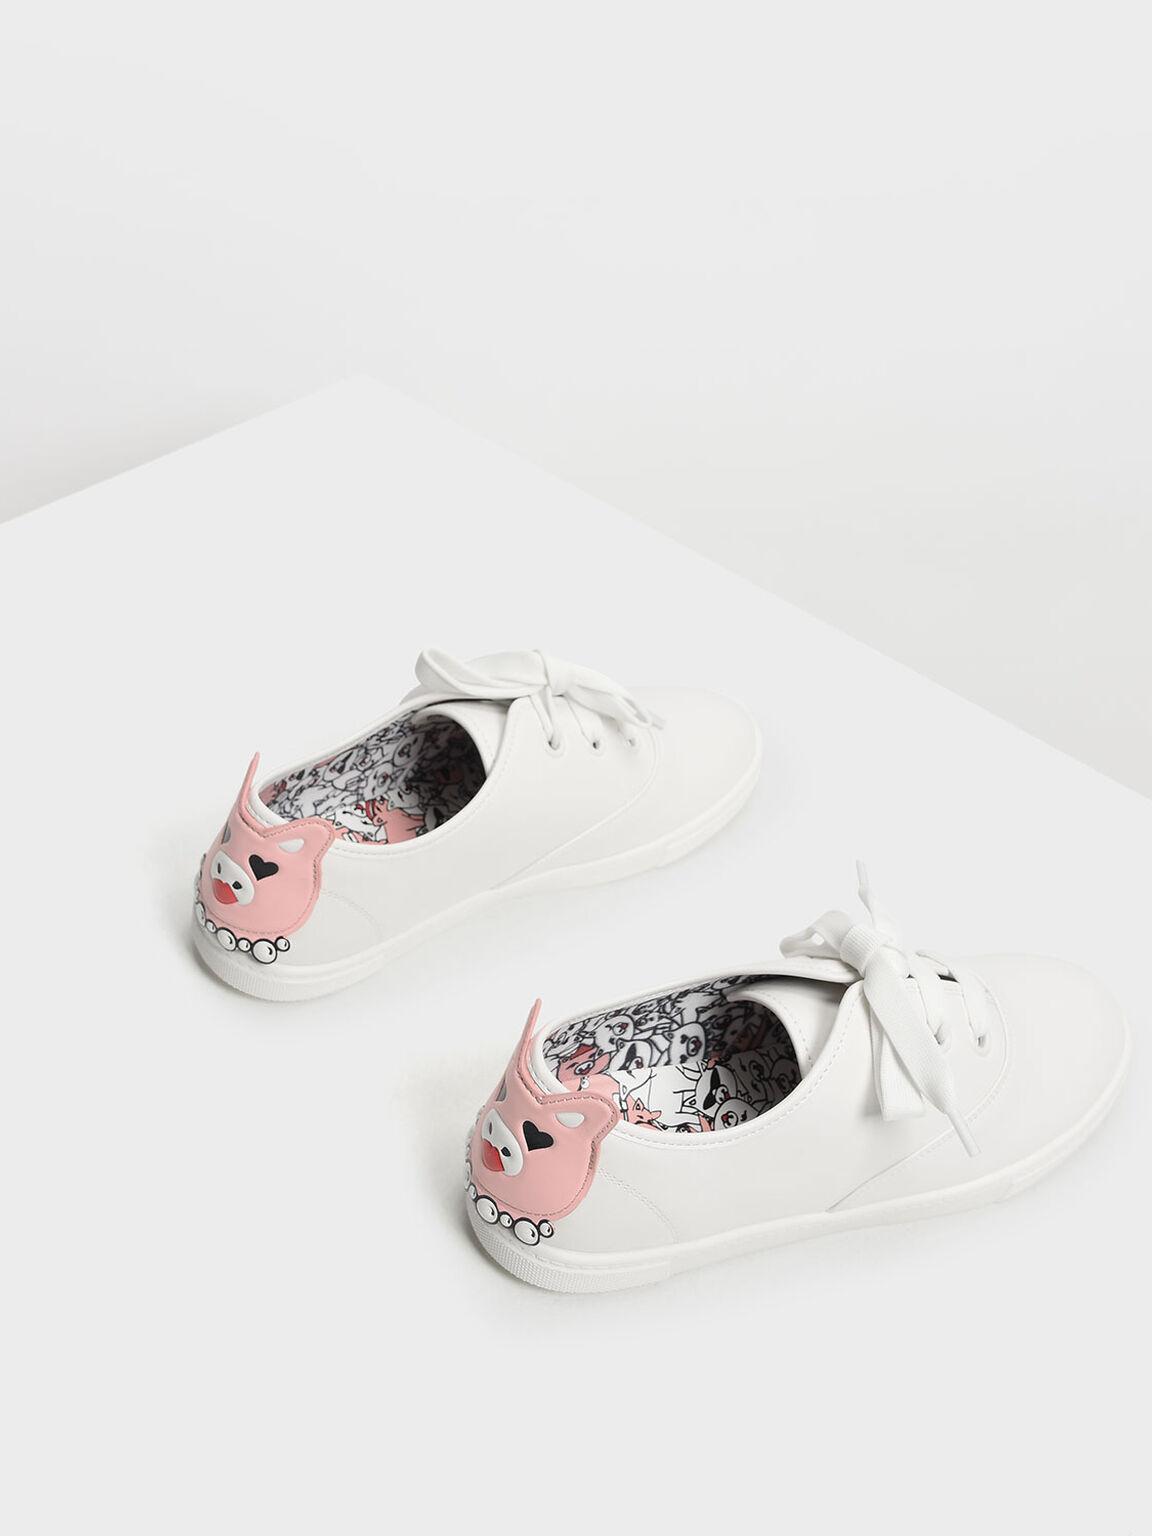 Zodiac Pig Sneakers, White, hi-res